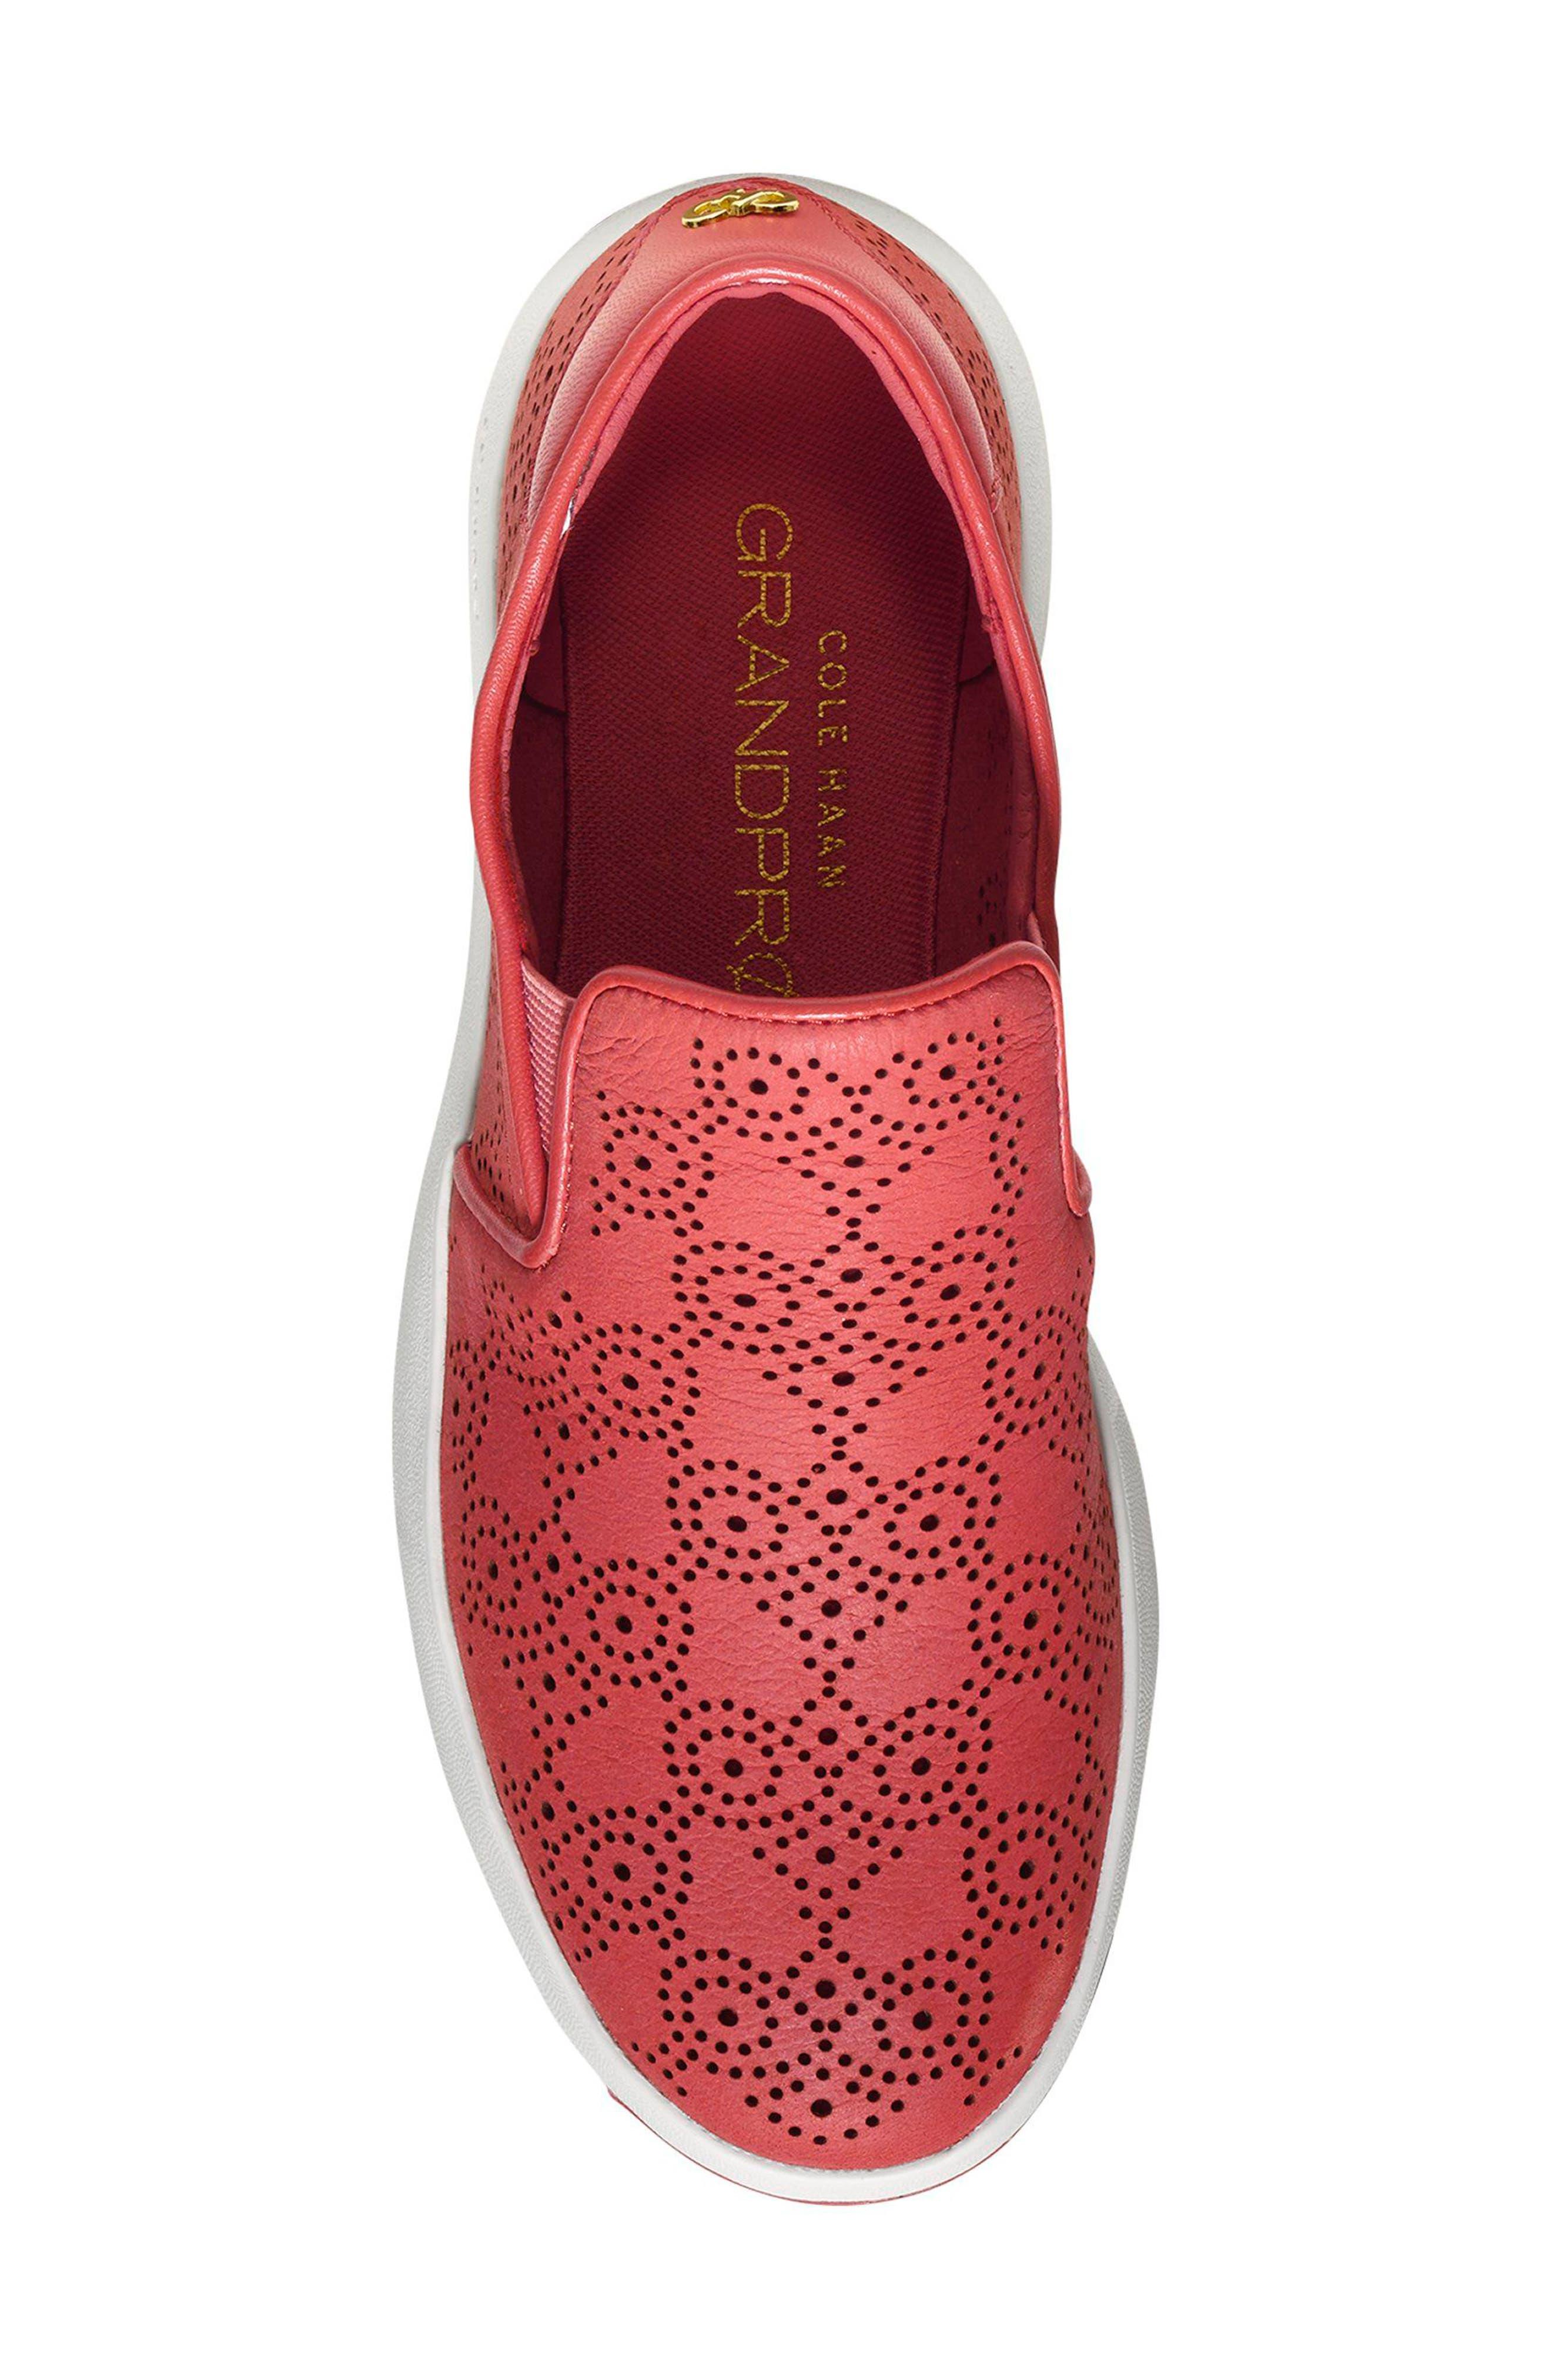 GrandPro Perforated Slip-On Sneaker,                             Alternate thumbnail 8, color,